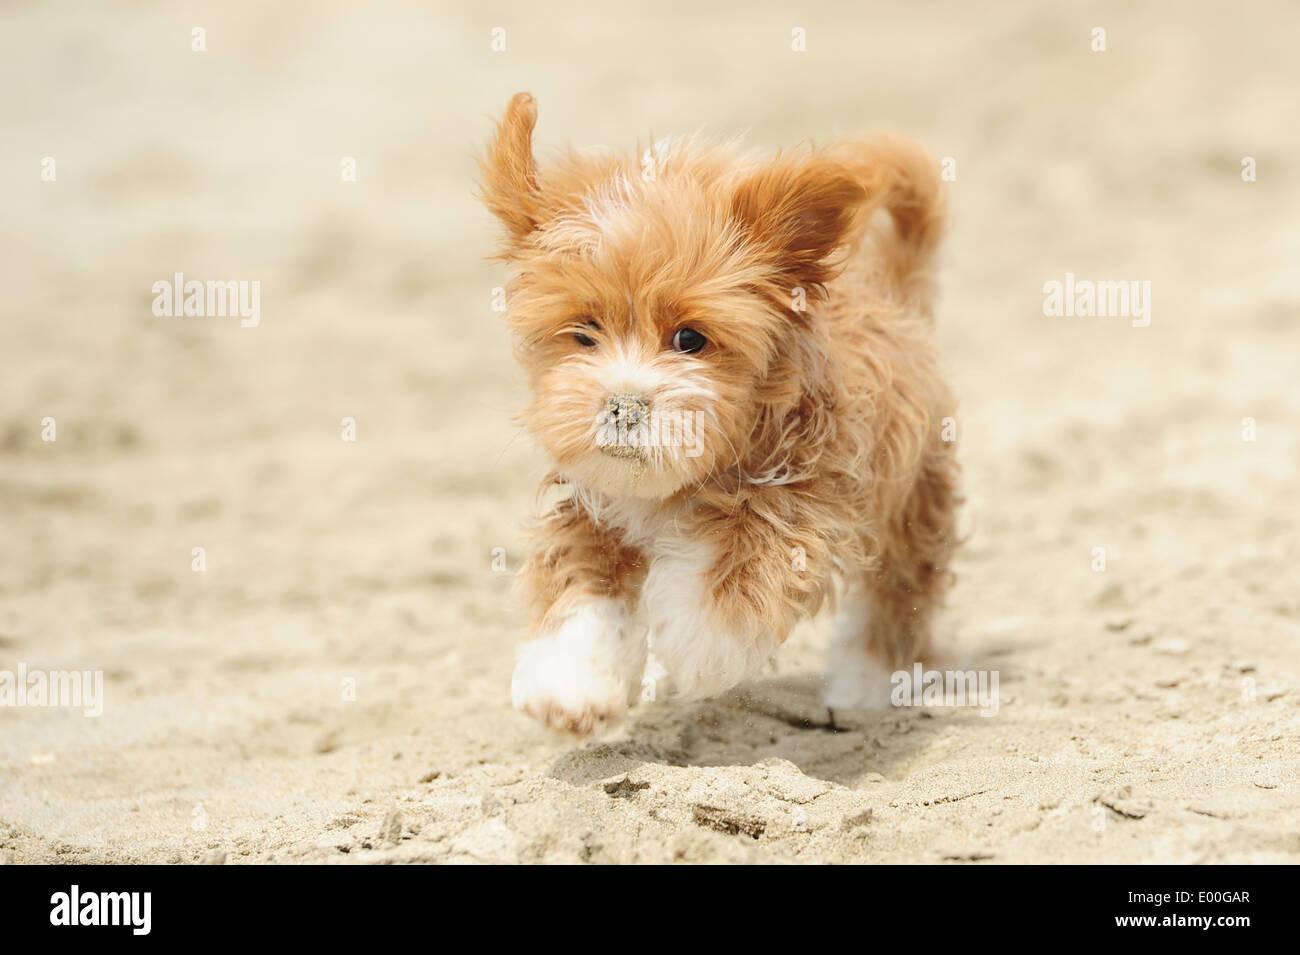 A Cute Dog Running On The Beach Stock Photo 68854319 Alamy